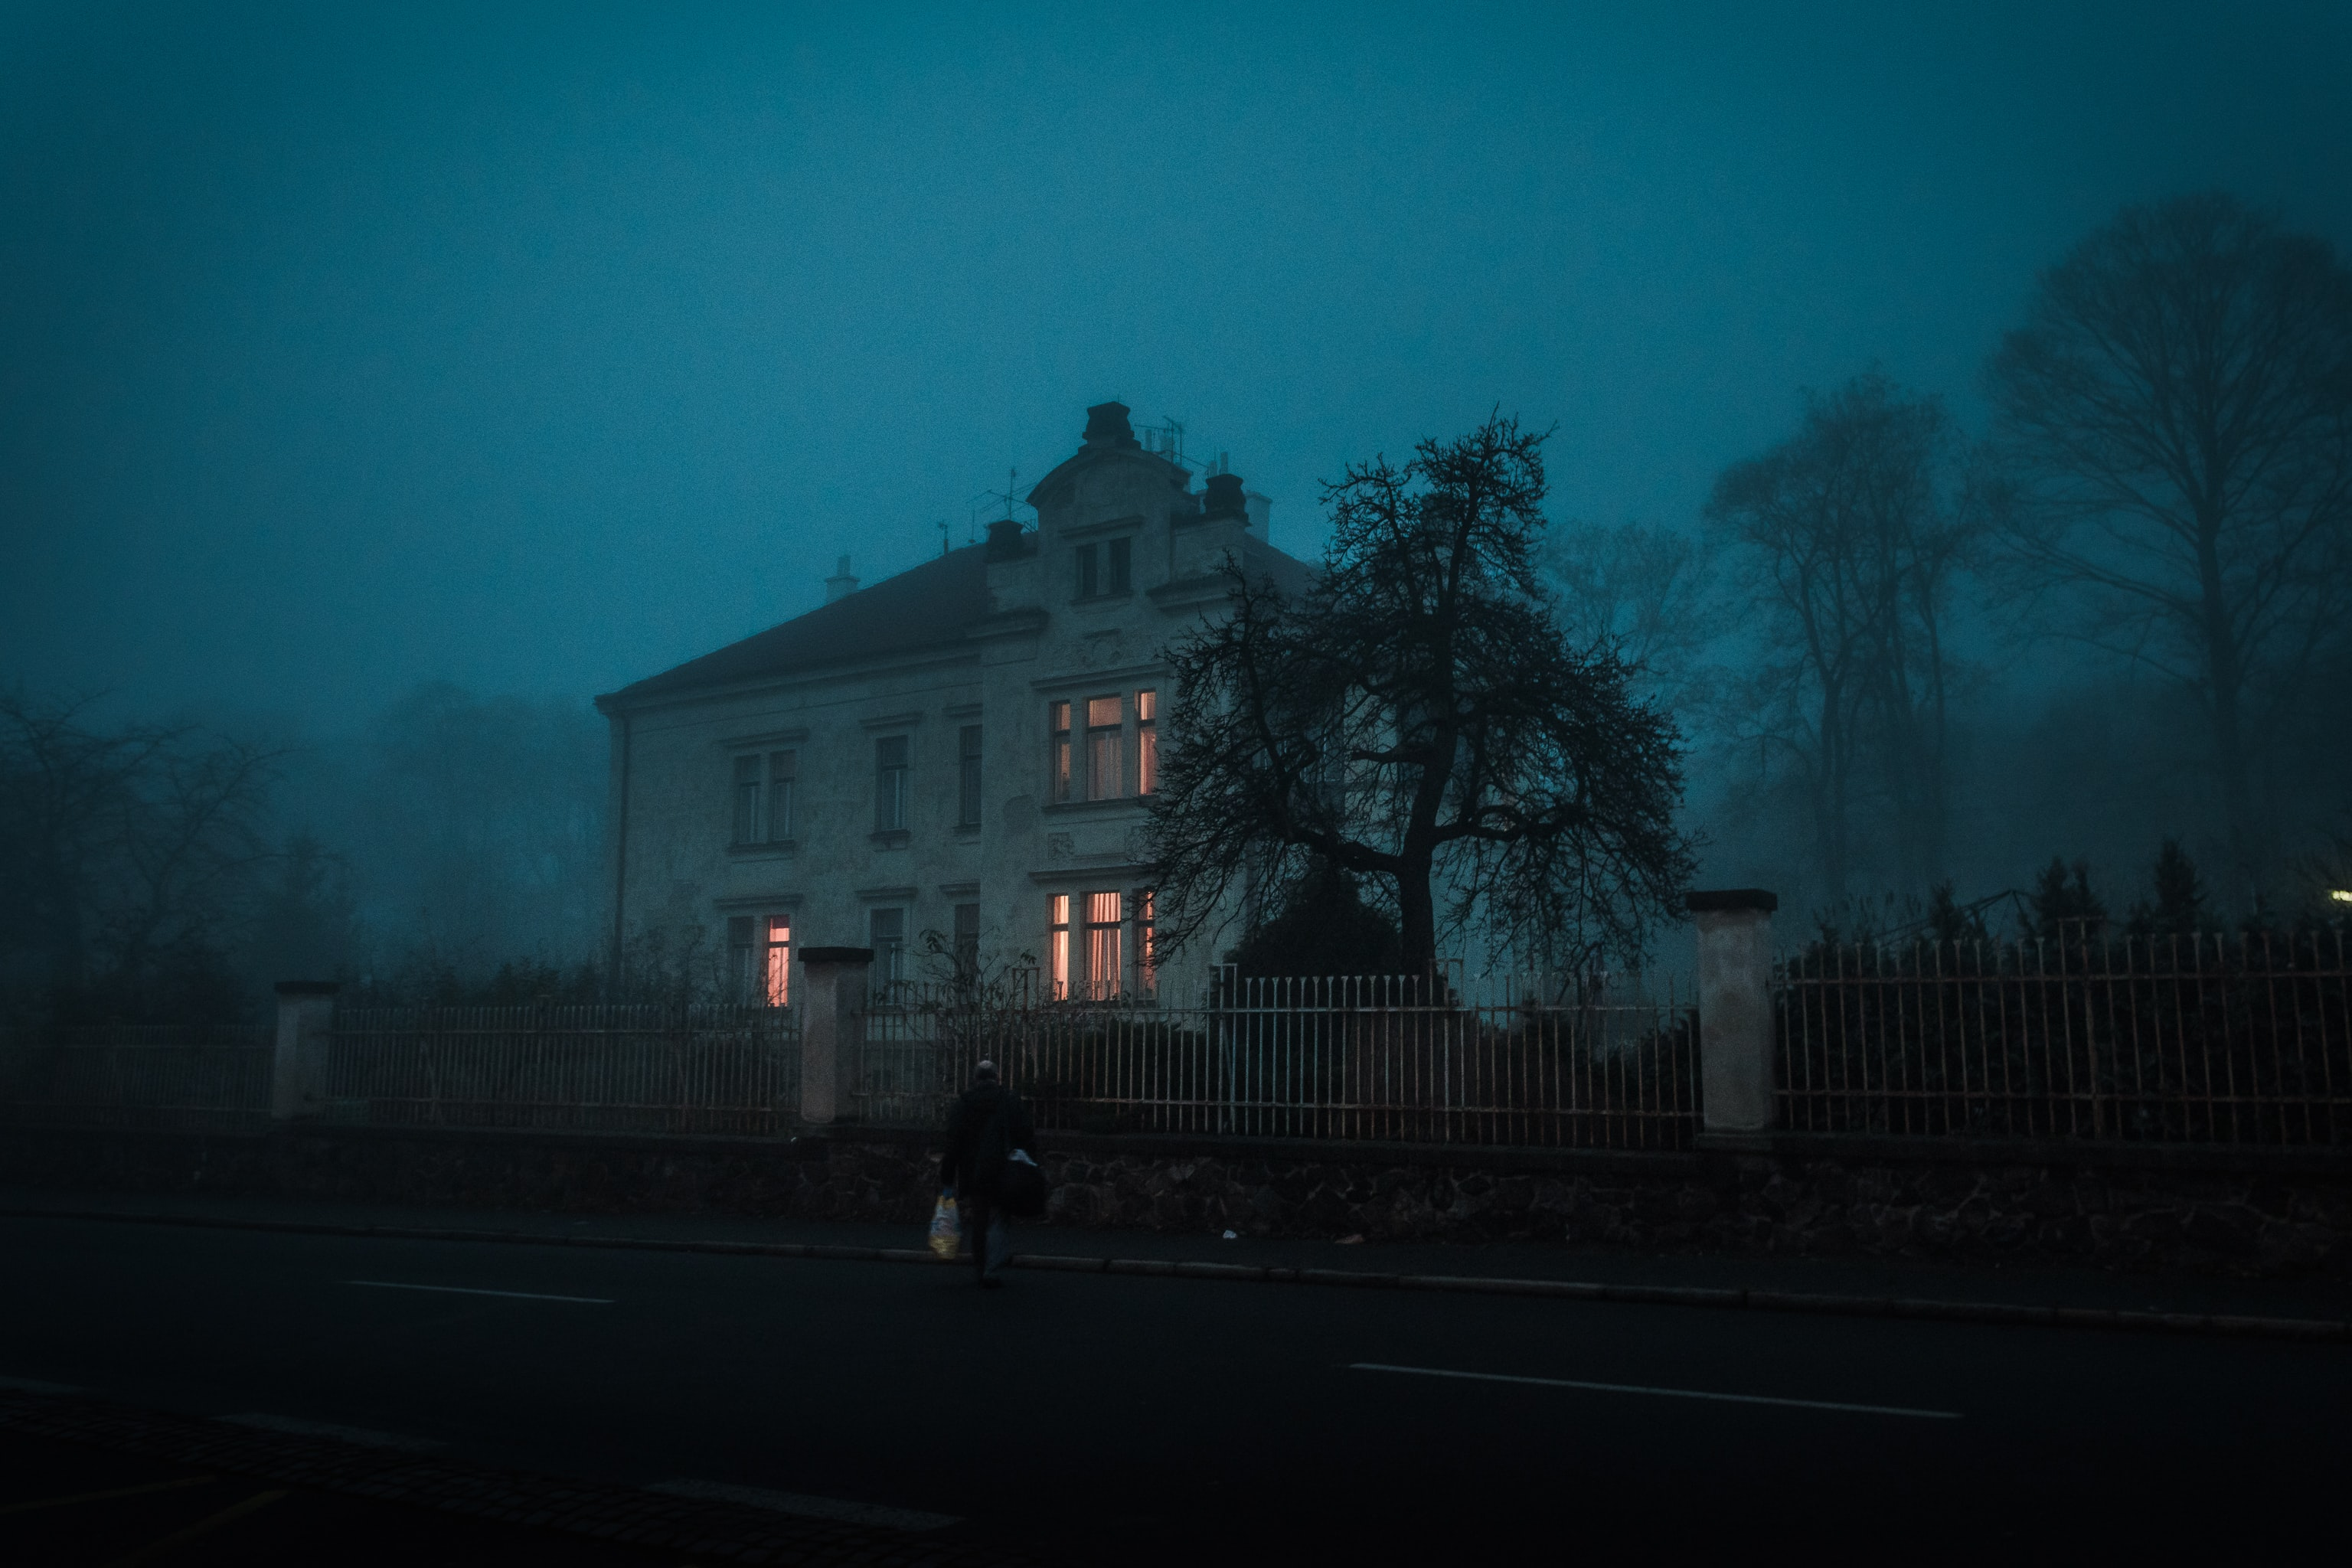 The Break In horror stories